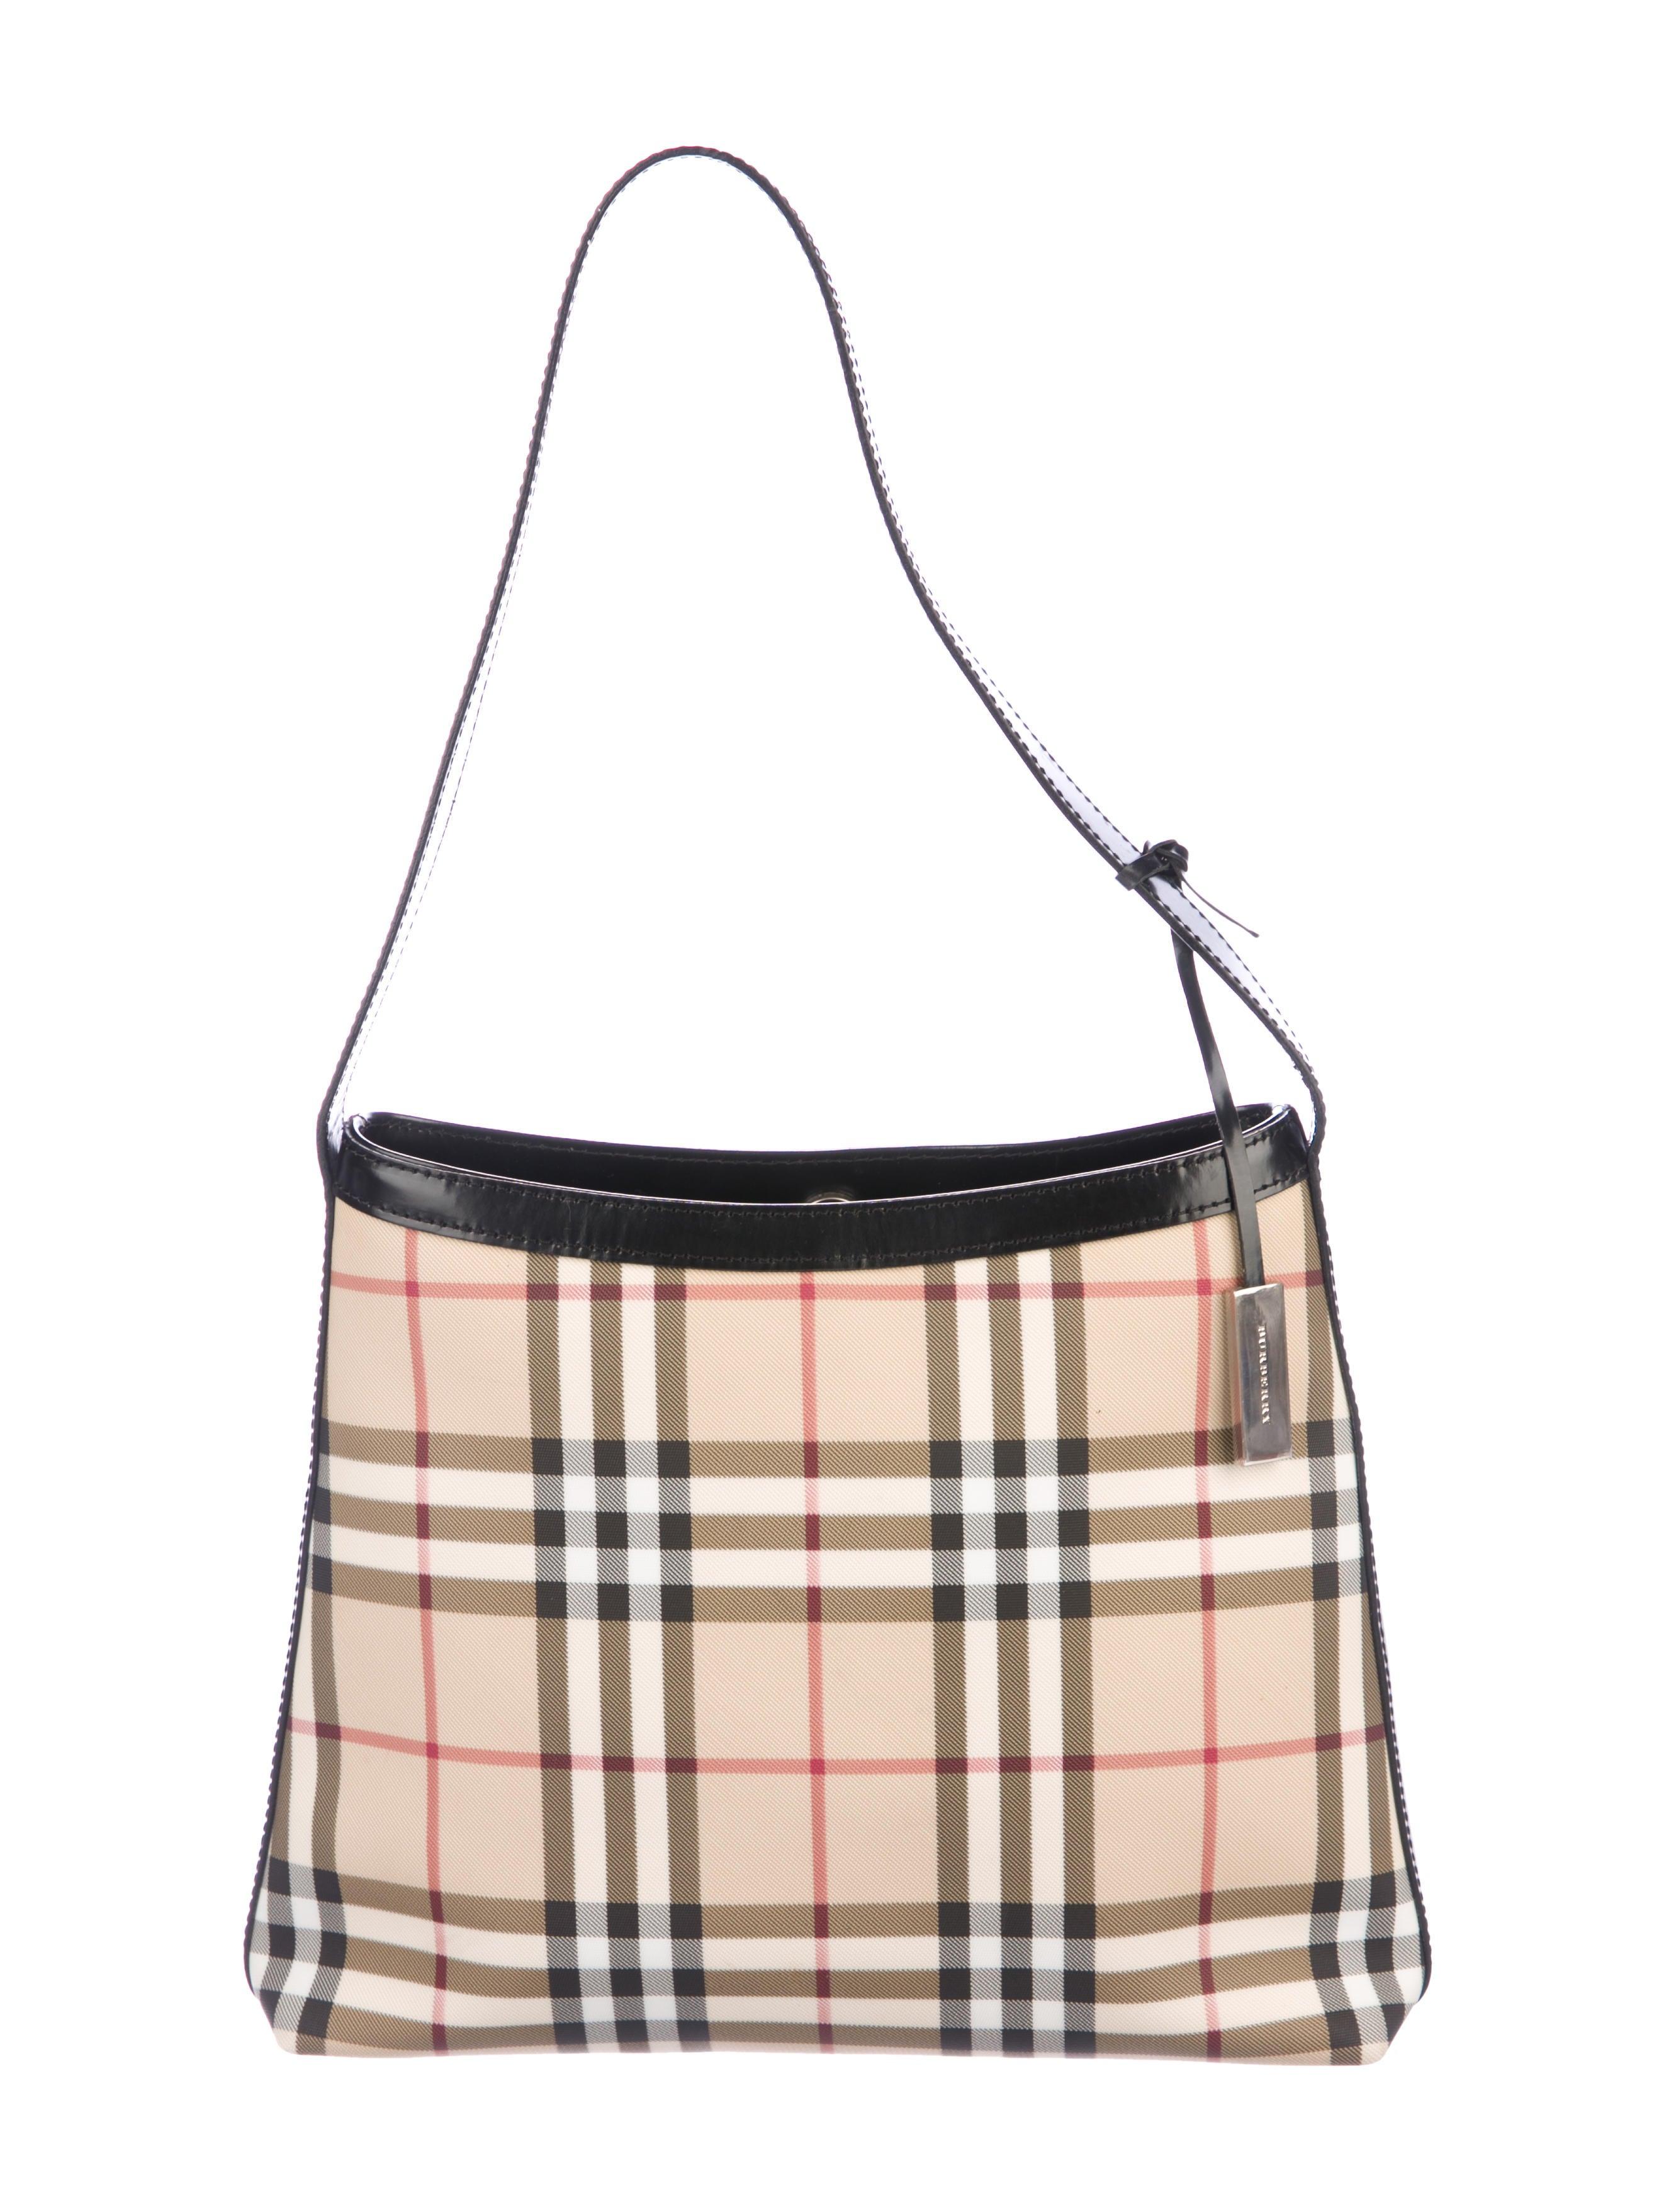 5d8b21df9226 Burberry London Nova Check Hobo - Handbags - WBURL32933